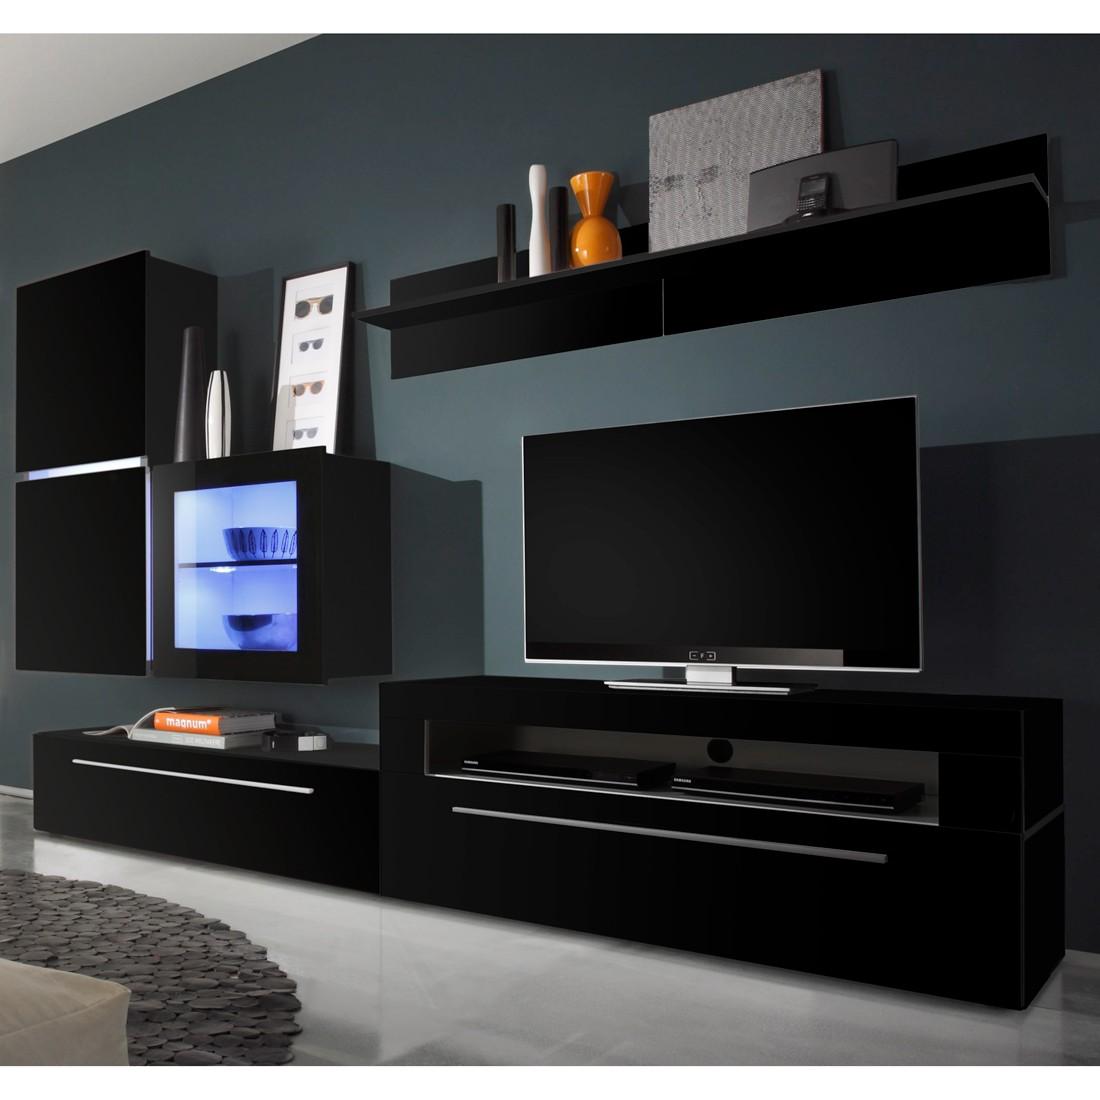 wohnwand polytop iv 6 teilig hochglanz schwarz tv. Black Bedroom Furniture Sets. Home Design Ideas